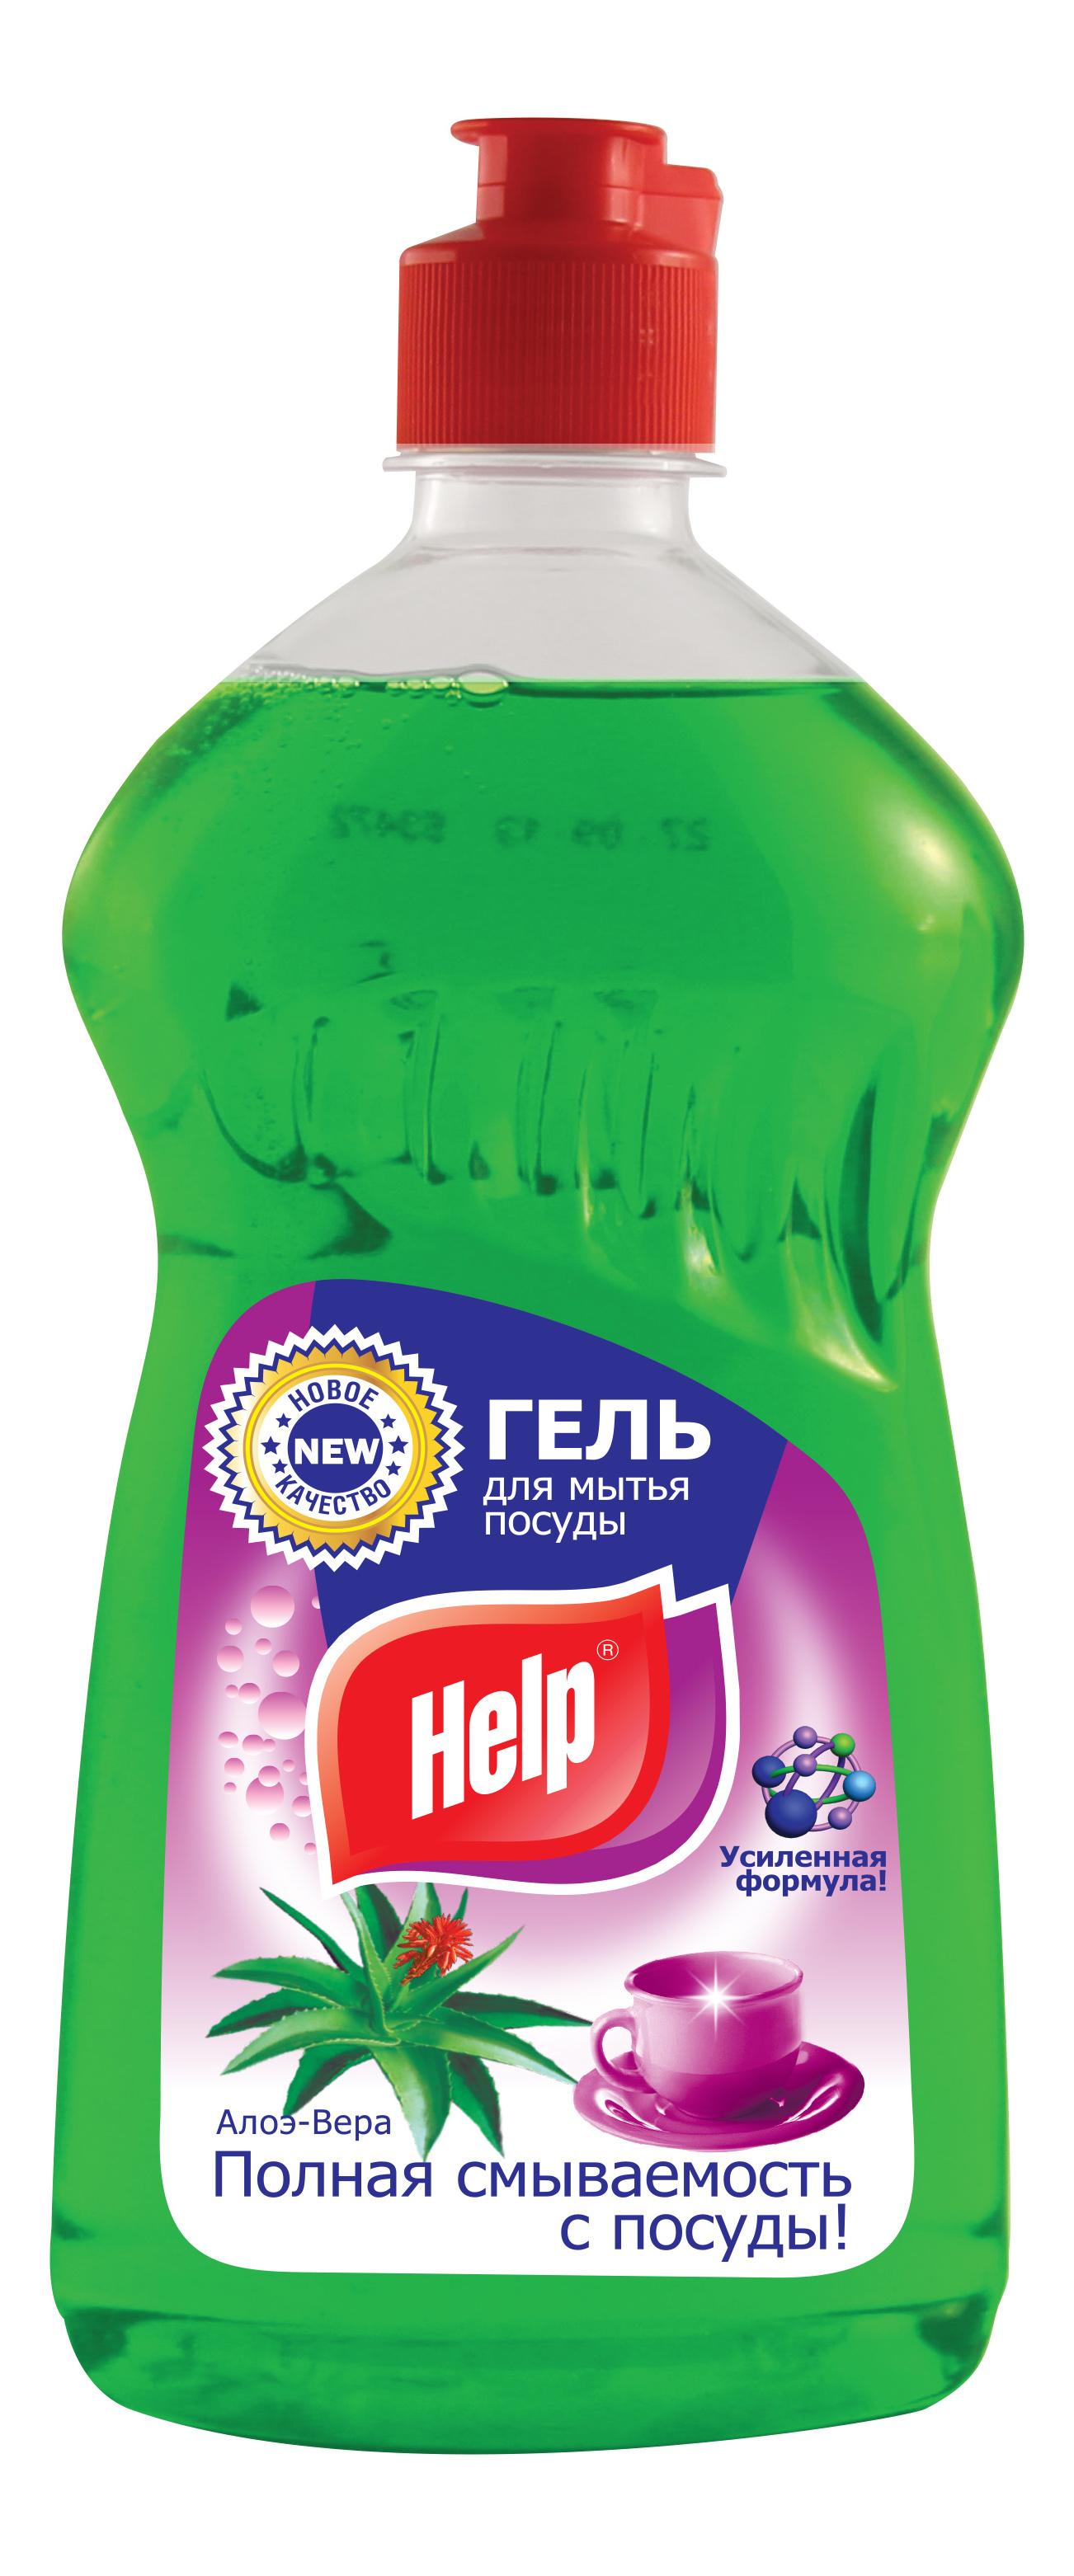 Средство для мытья посуды Help алоэ вера 500 мл